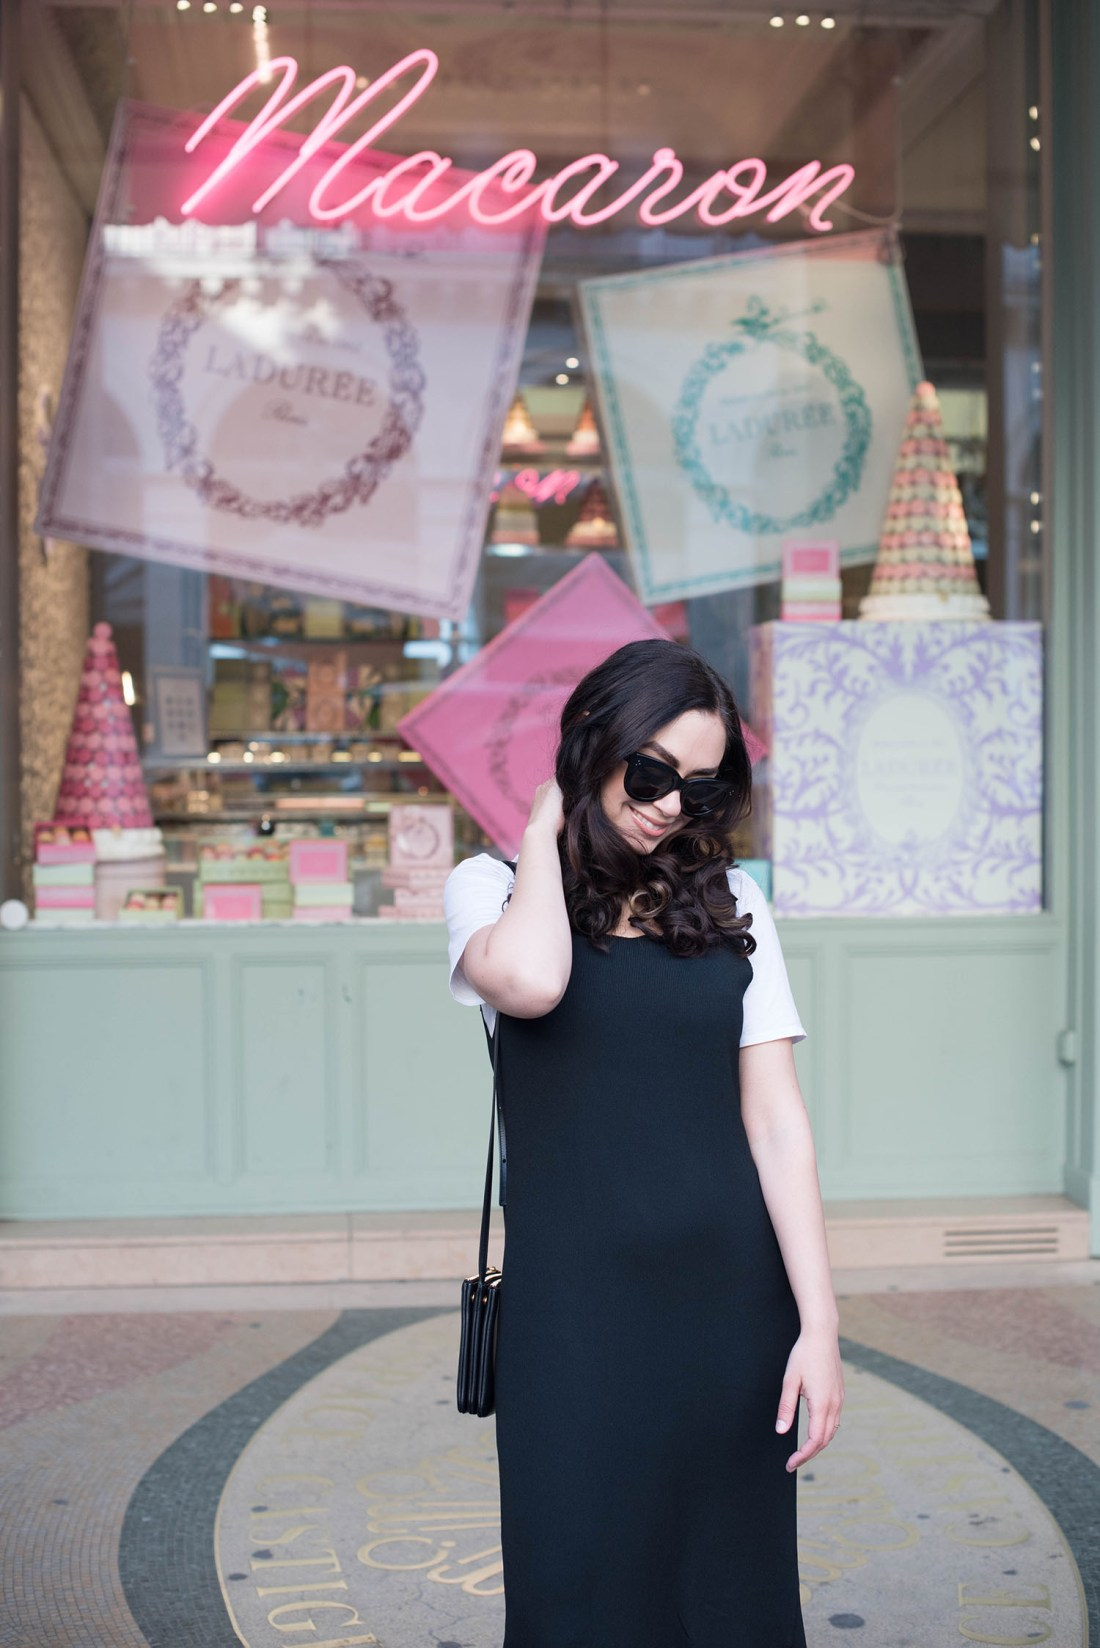 Portrait of style blogger Cee Fardoe of Coco & Vera, wearing a Metisu dress at Laduree in Paris